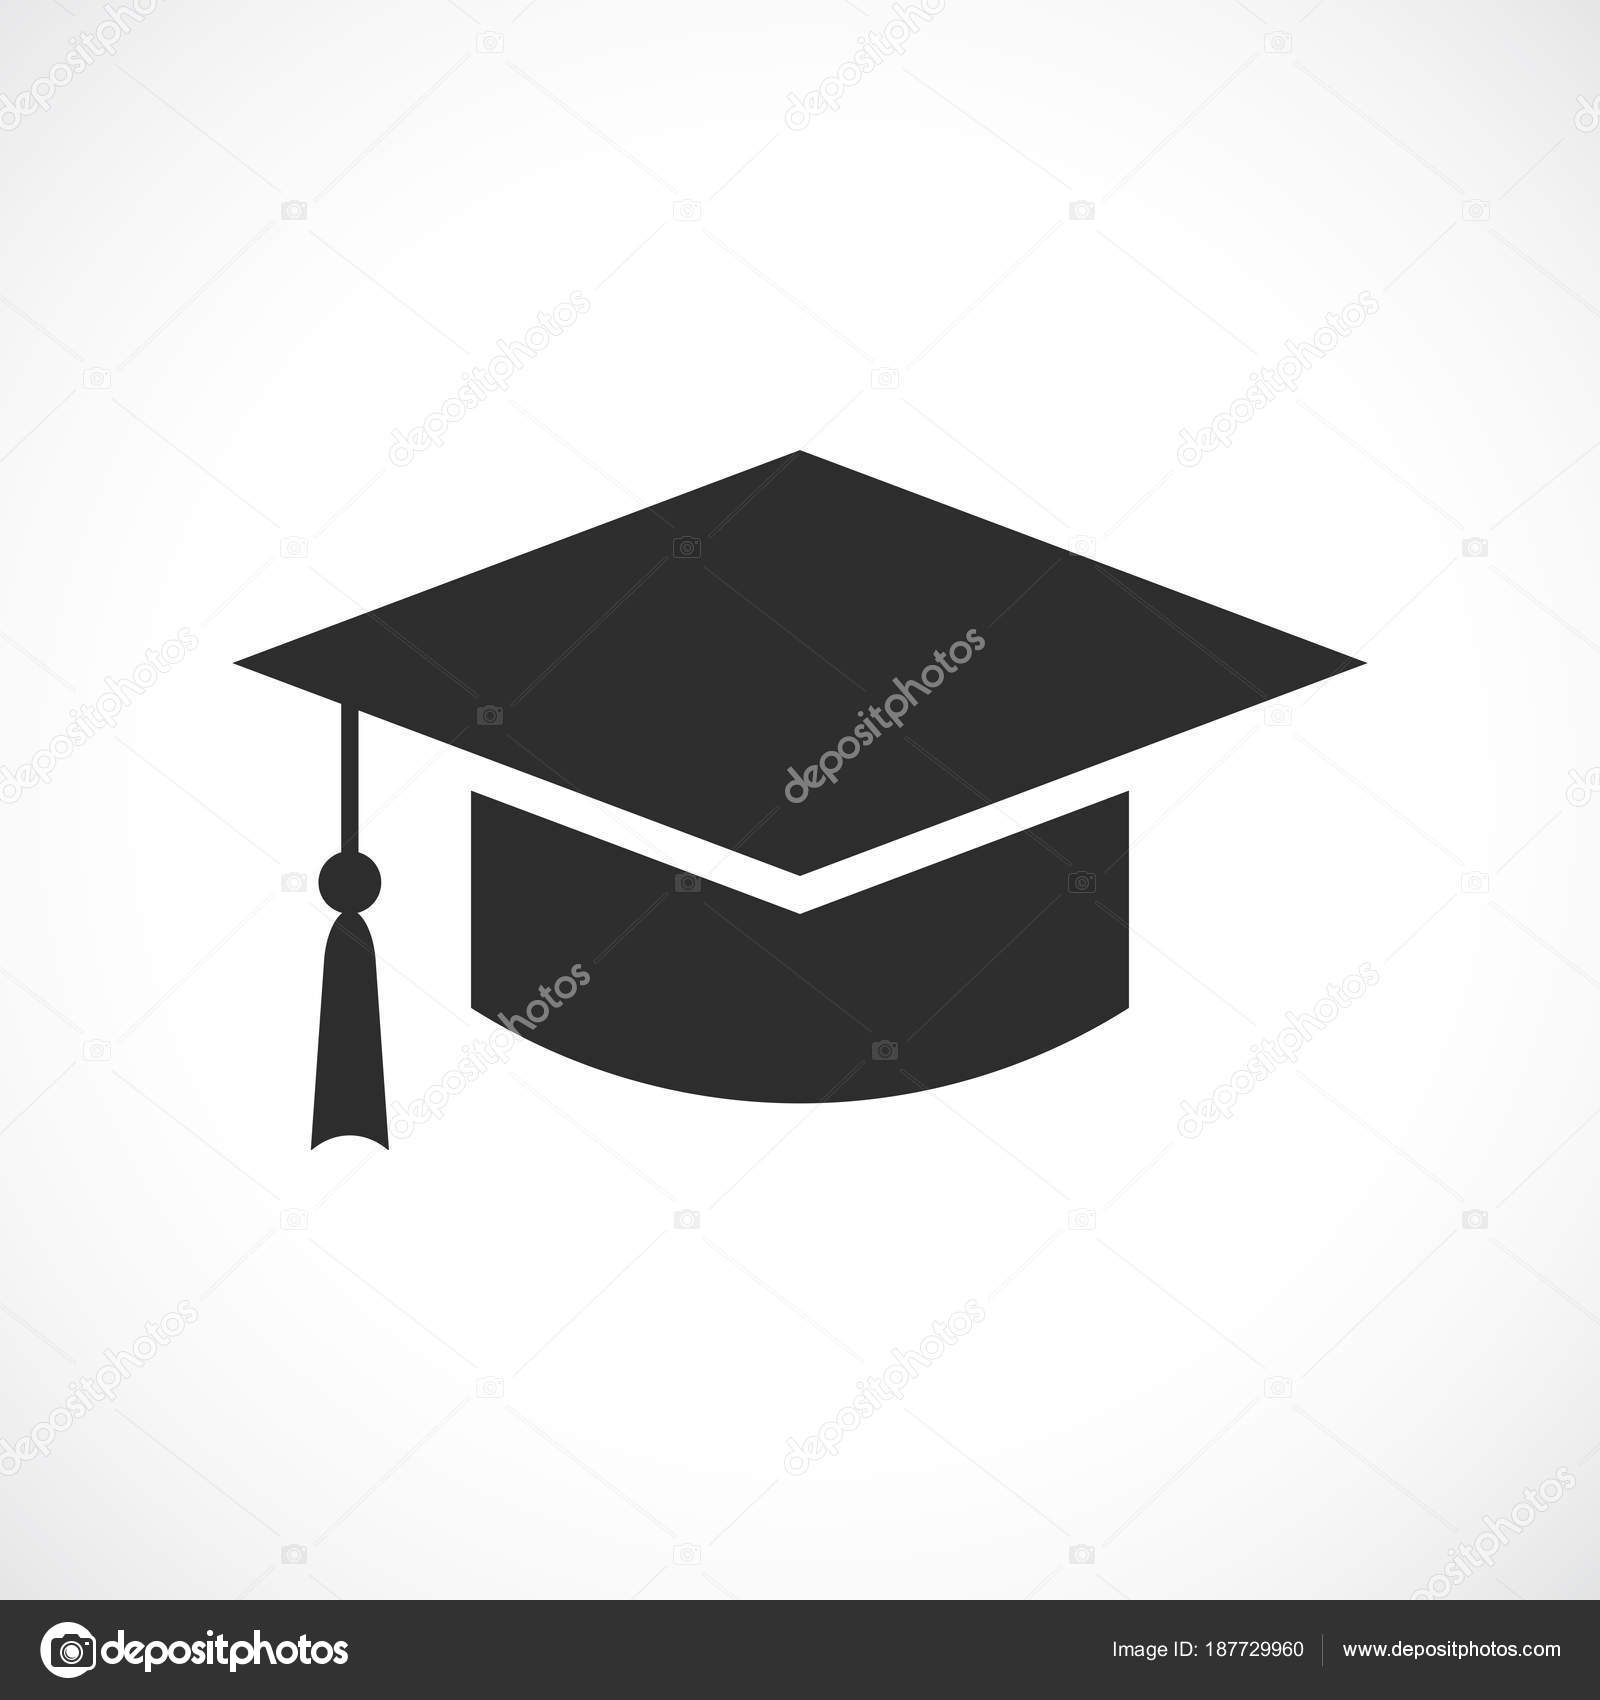 Akademiker Hut Symbol: Dem Studium Akademischer Hut-Symbol